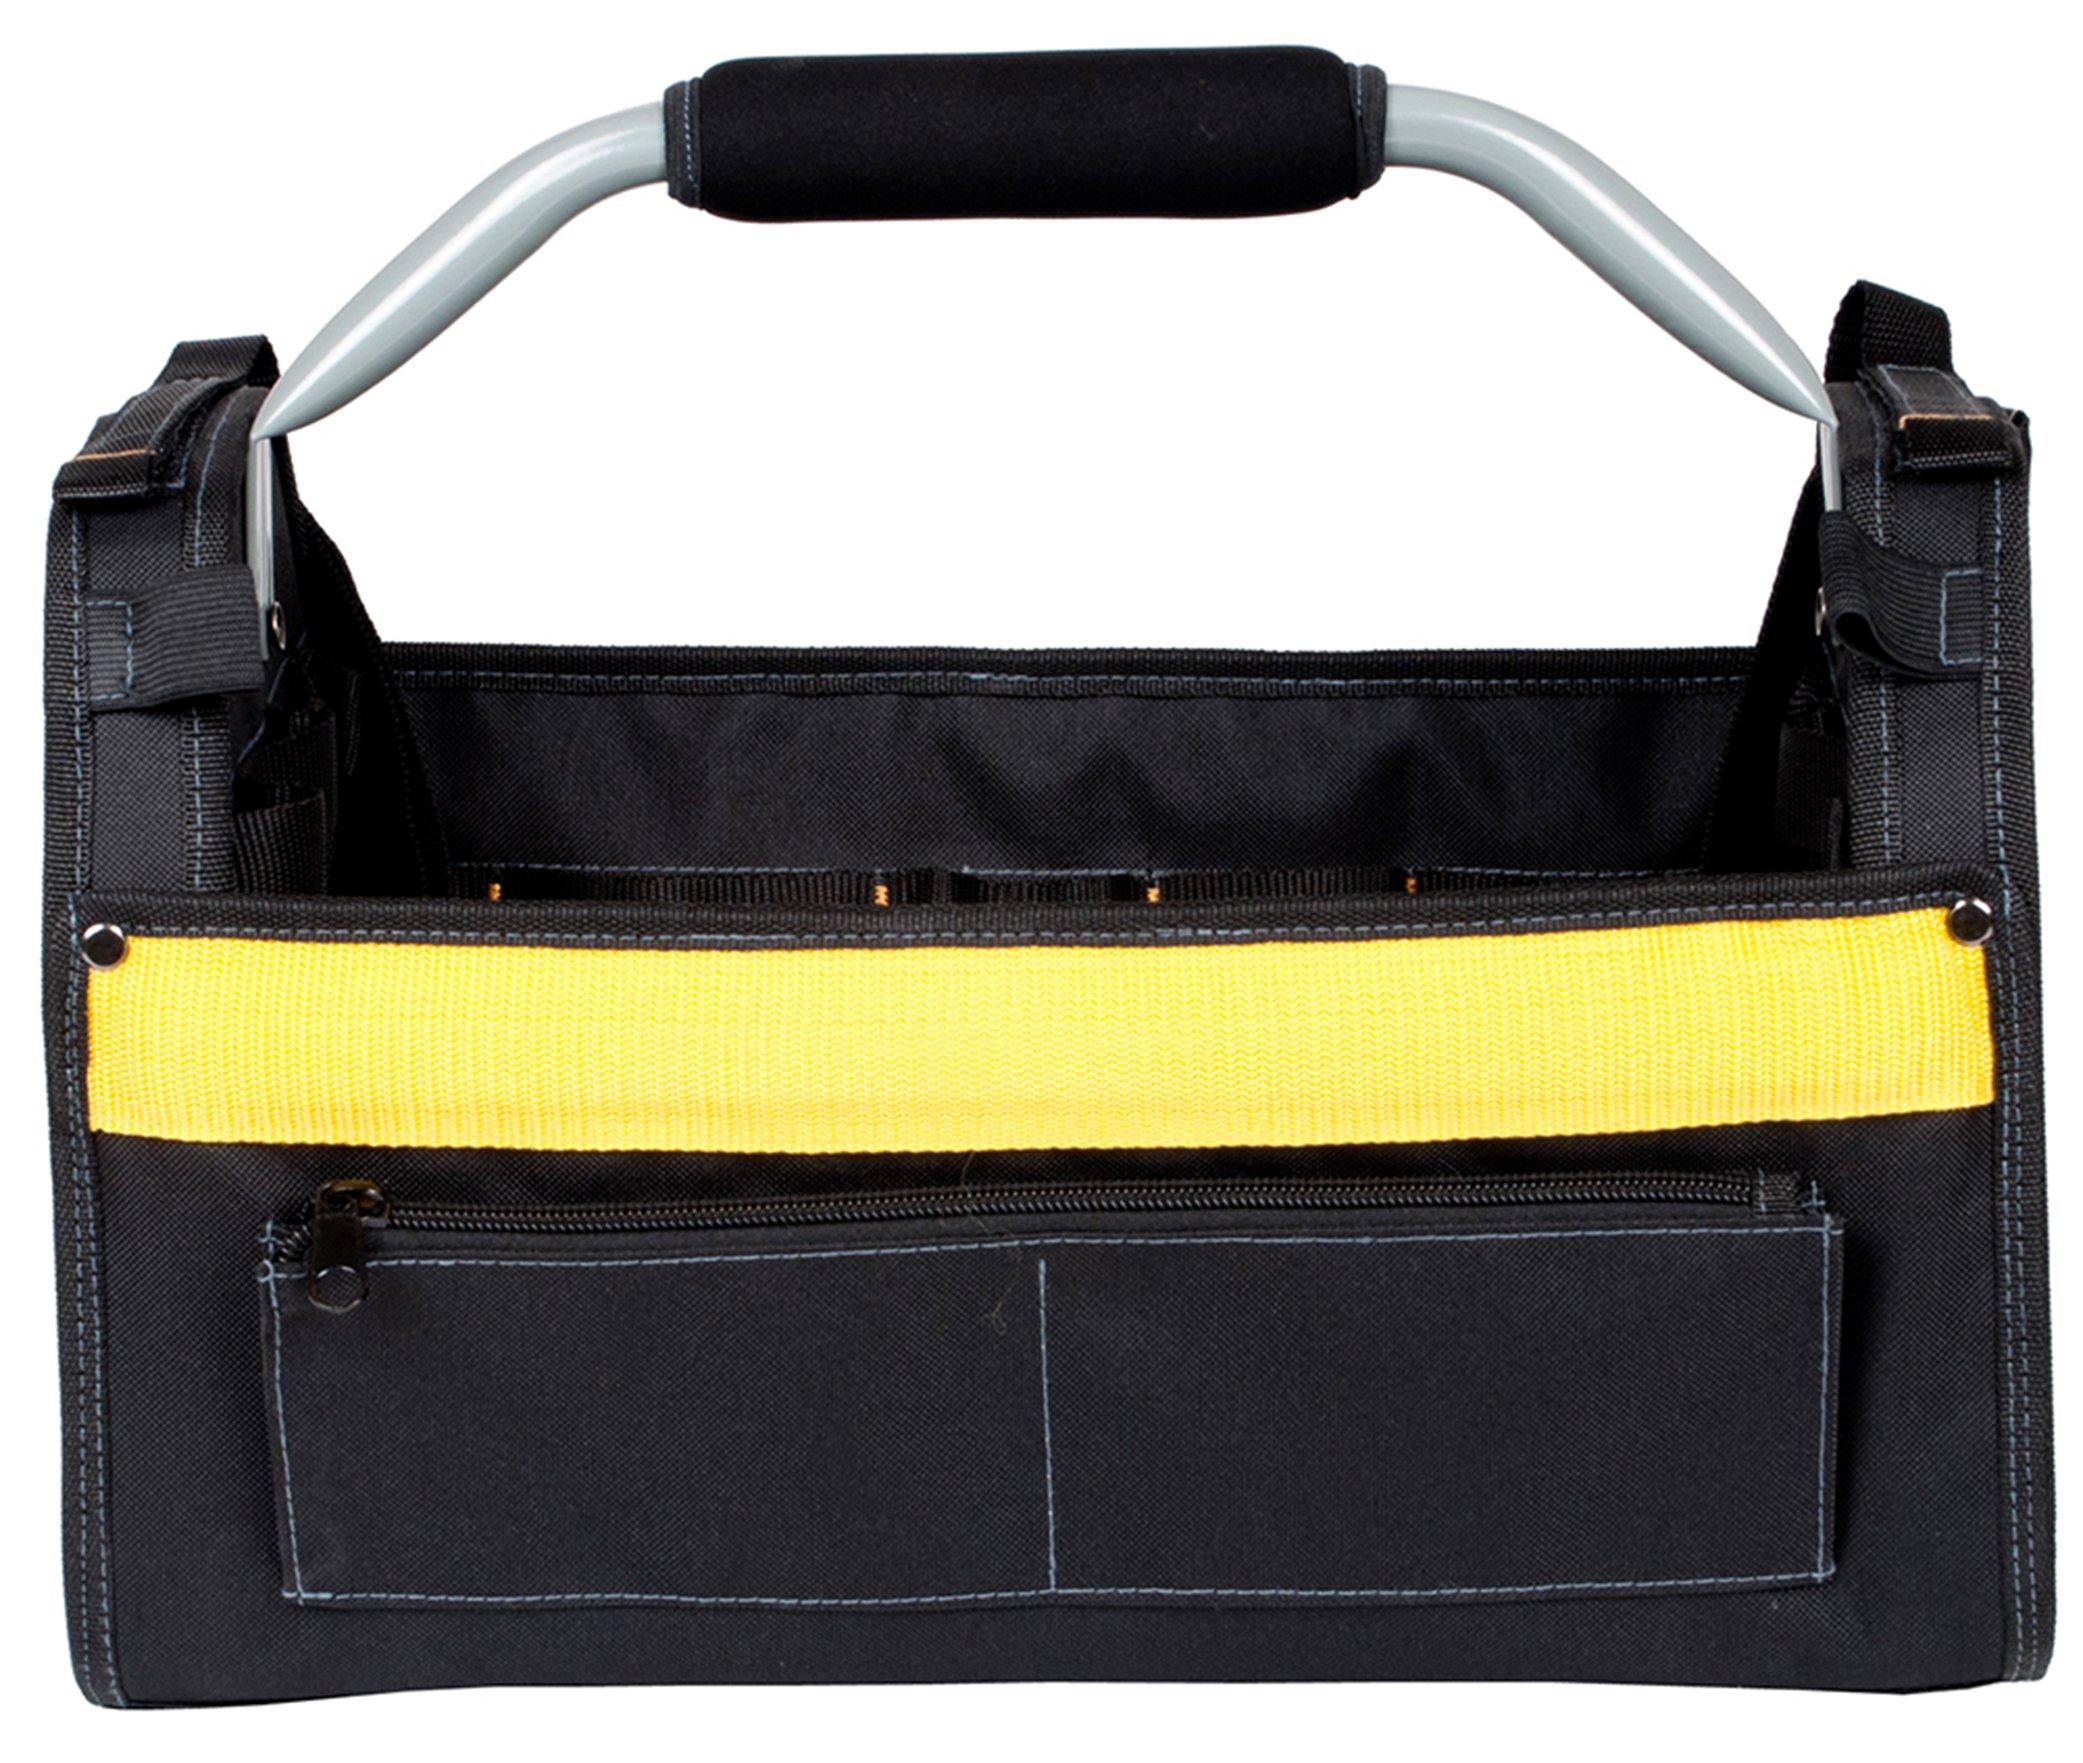 Holmes Workwear 60-9004-MH 16-inch Heavy Duty Tool Bag by Holmes (Image #3)